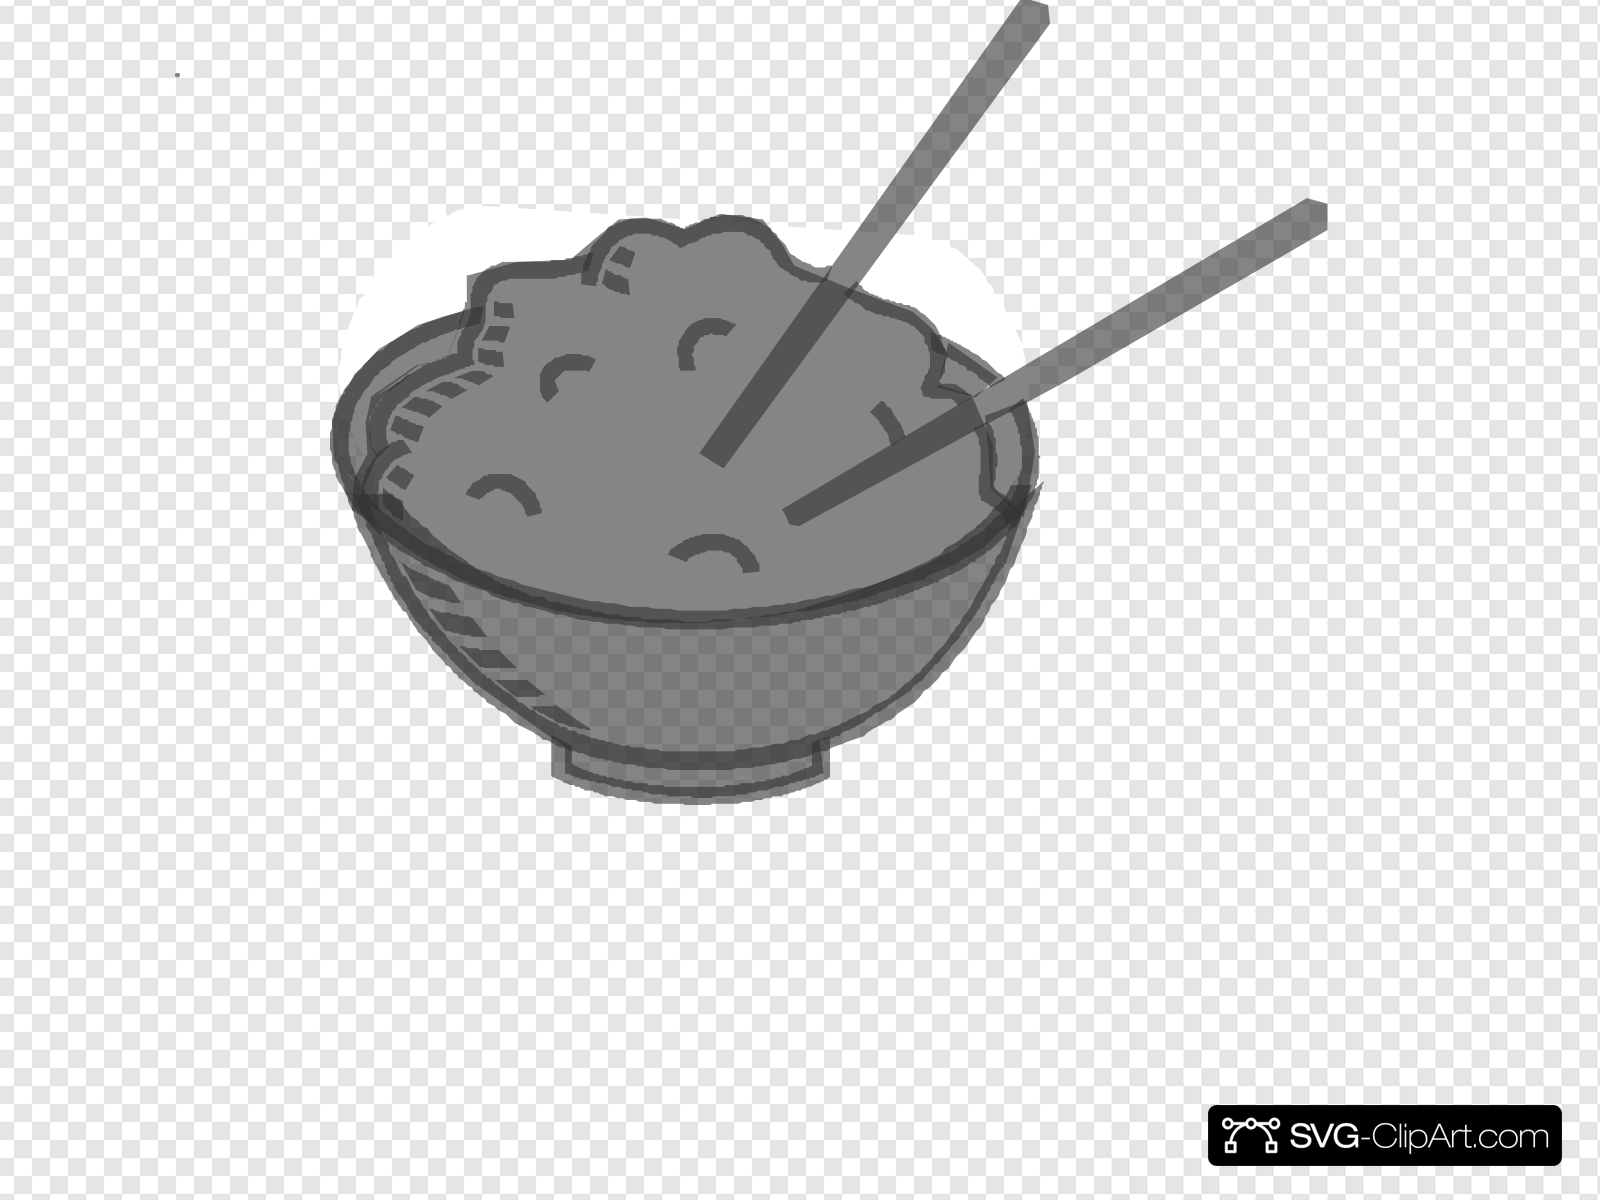 Bowl grey clip art. Rice clipart svg